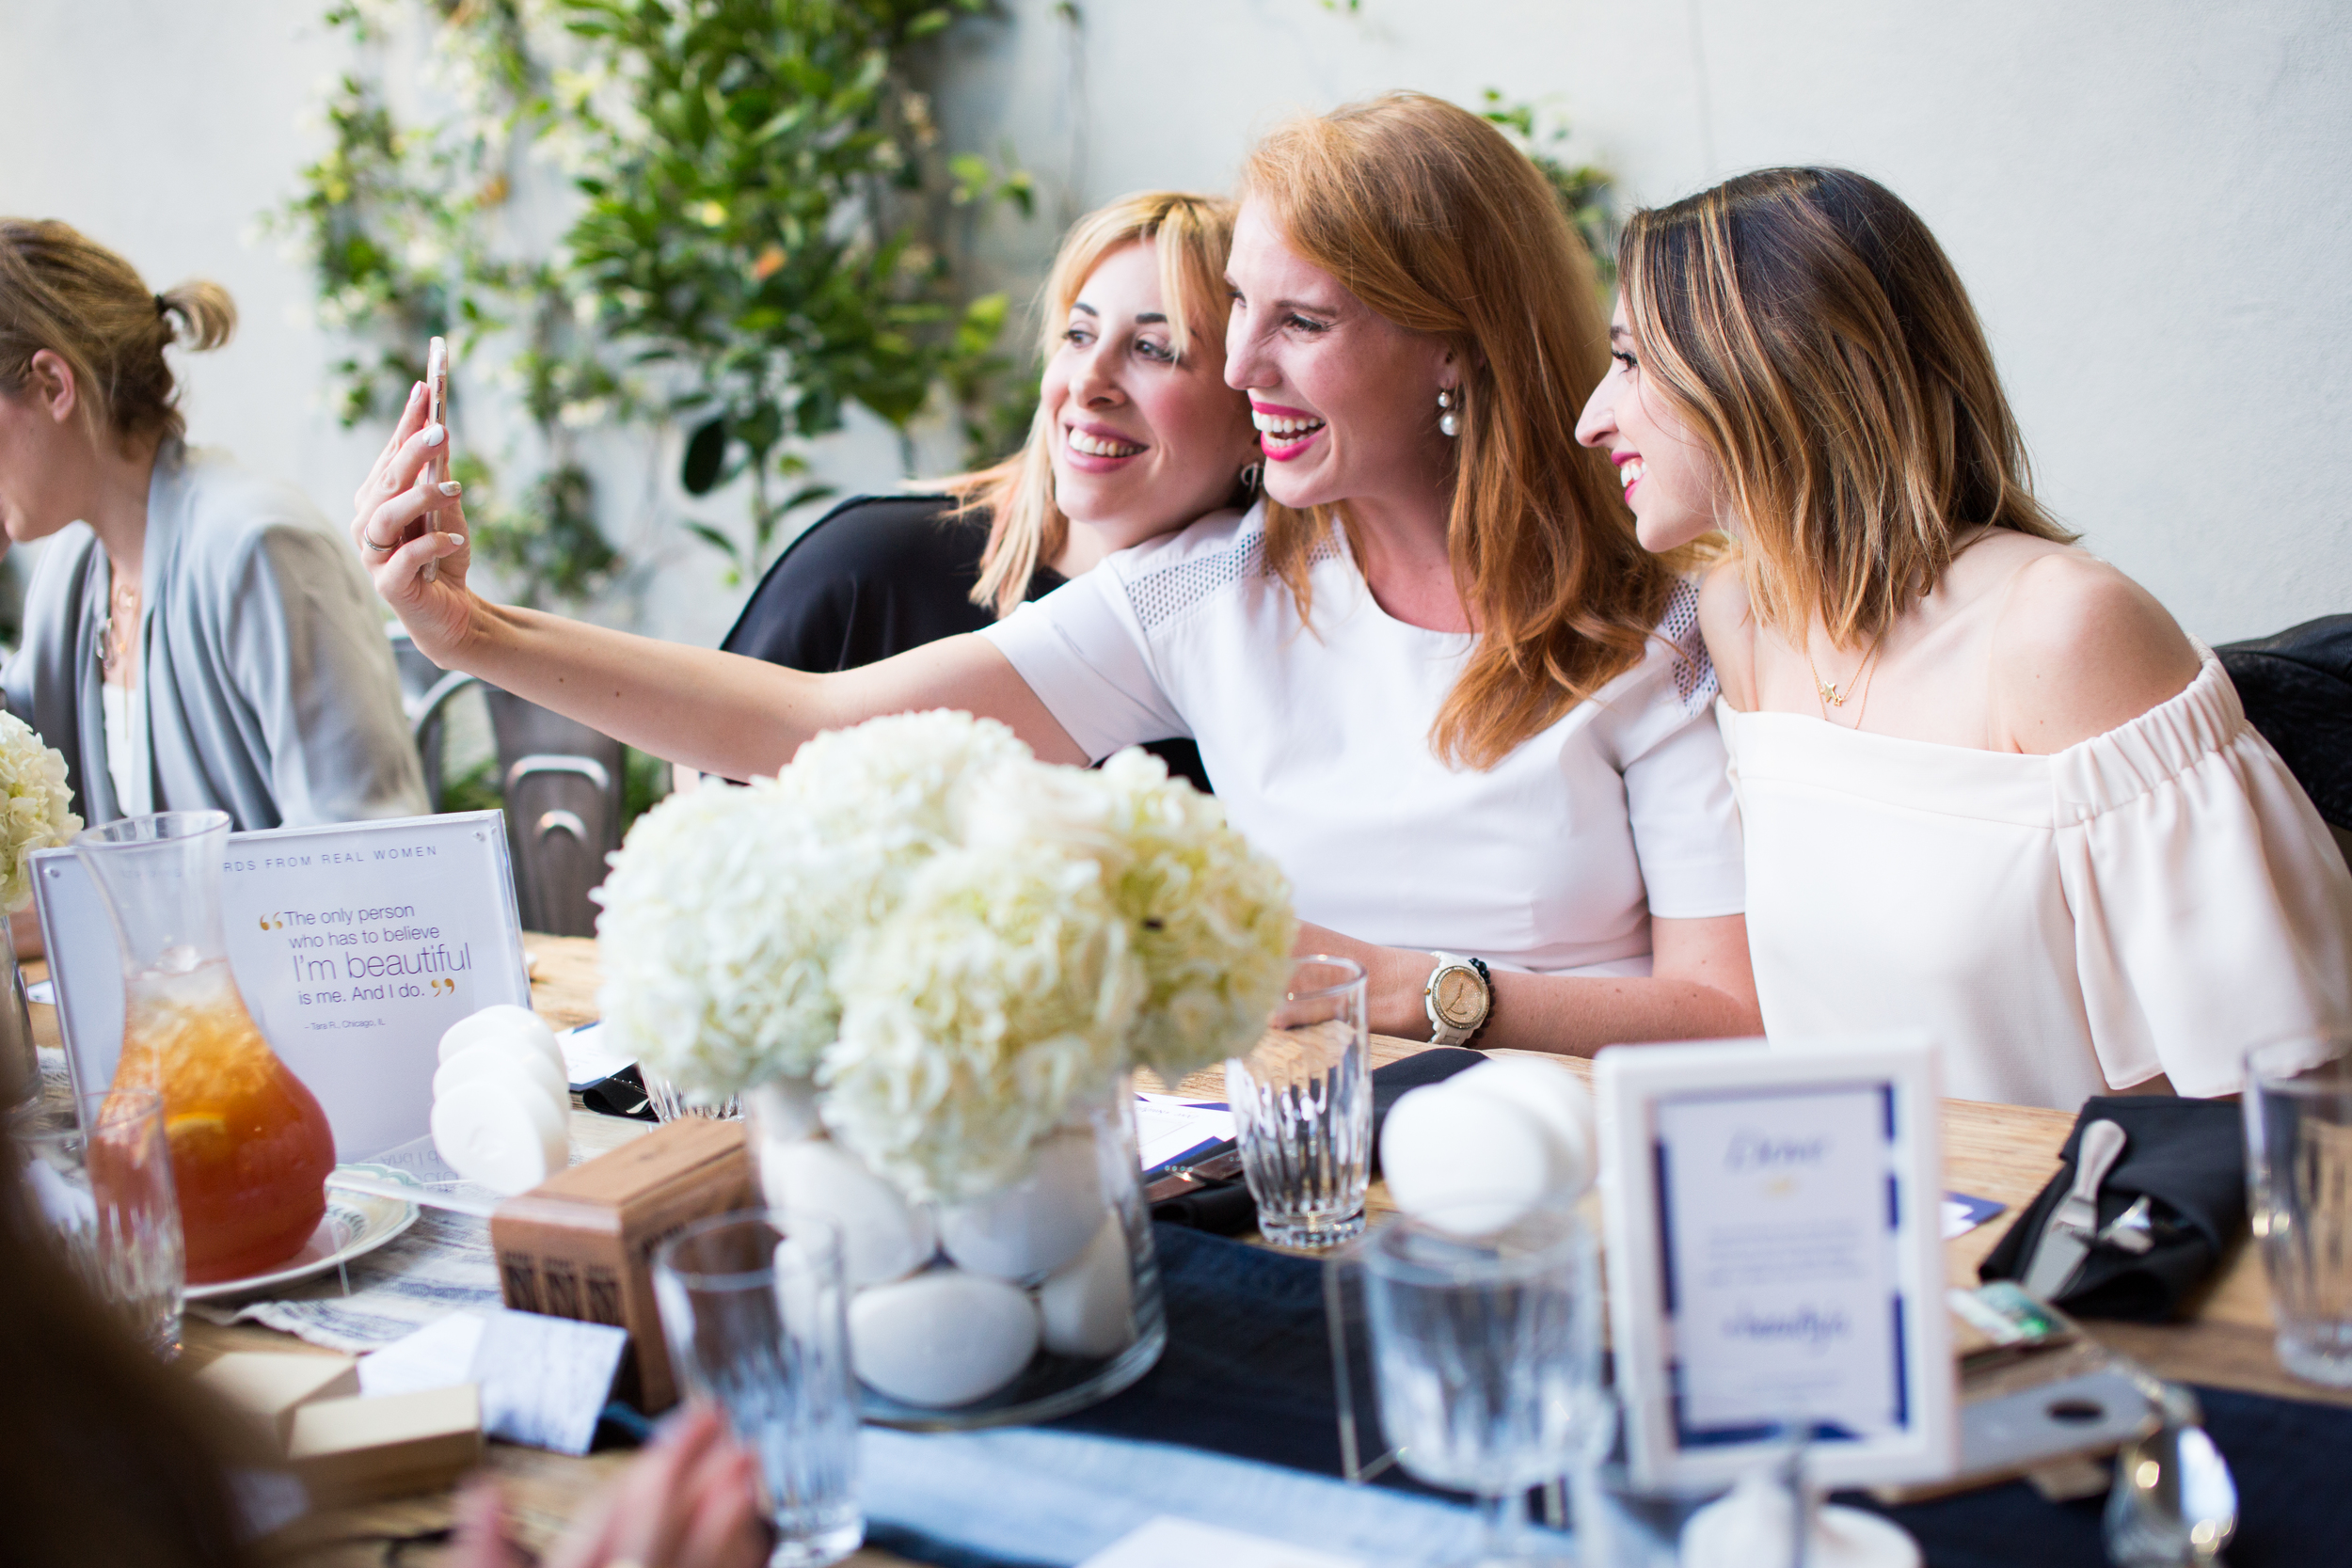 Jessy Fofana, Maxie McCoy, and Jaclyne Franciscone snap a #BeautyIs selfie.